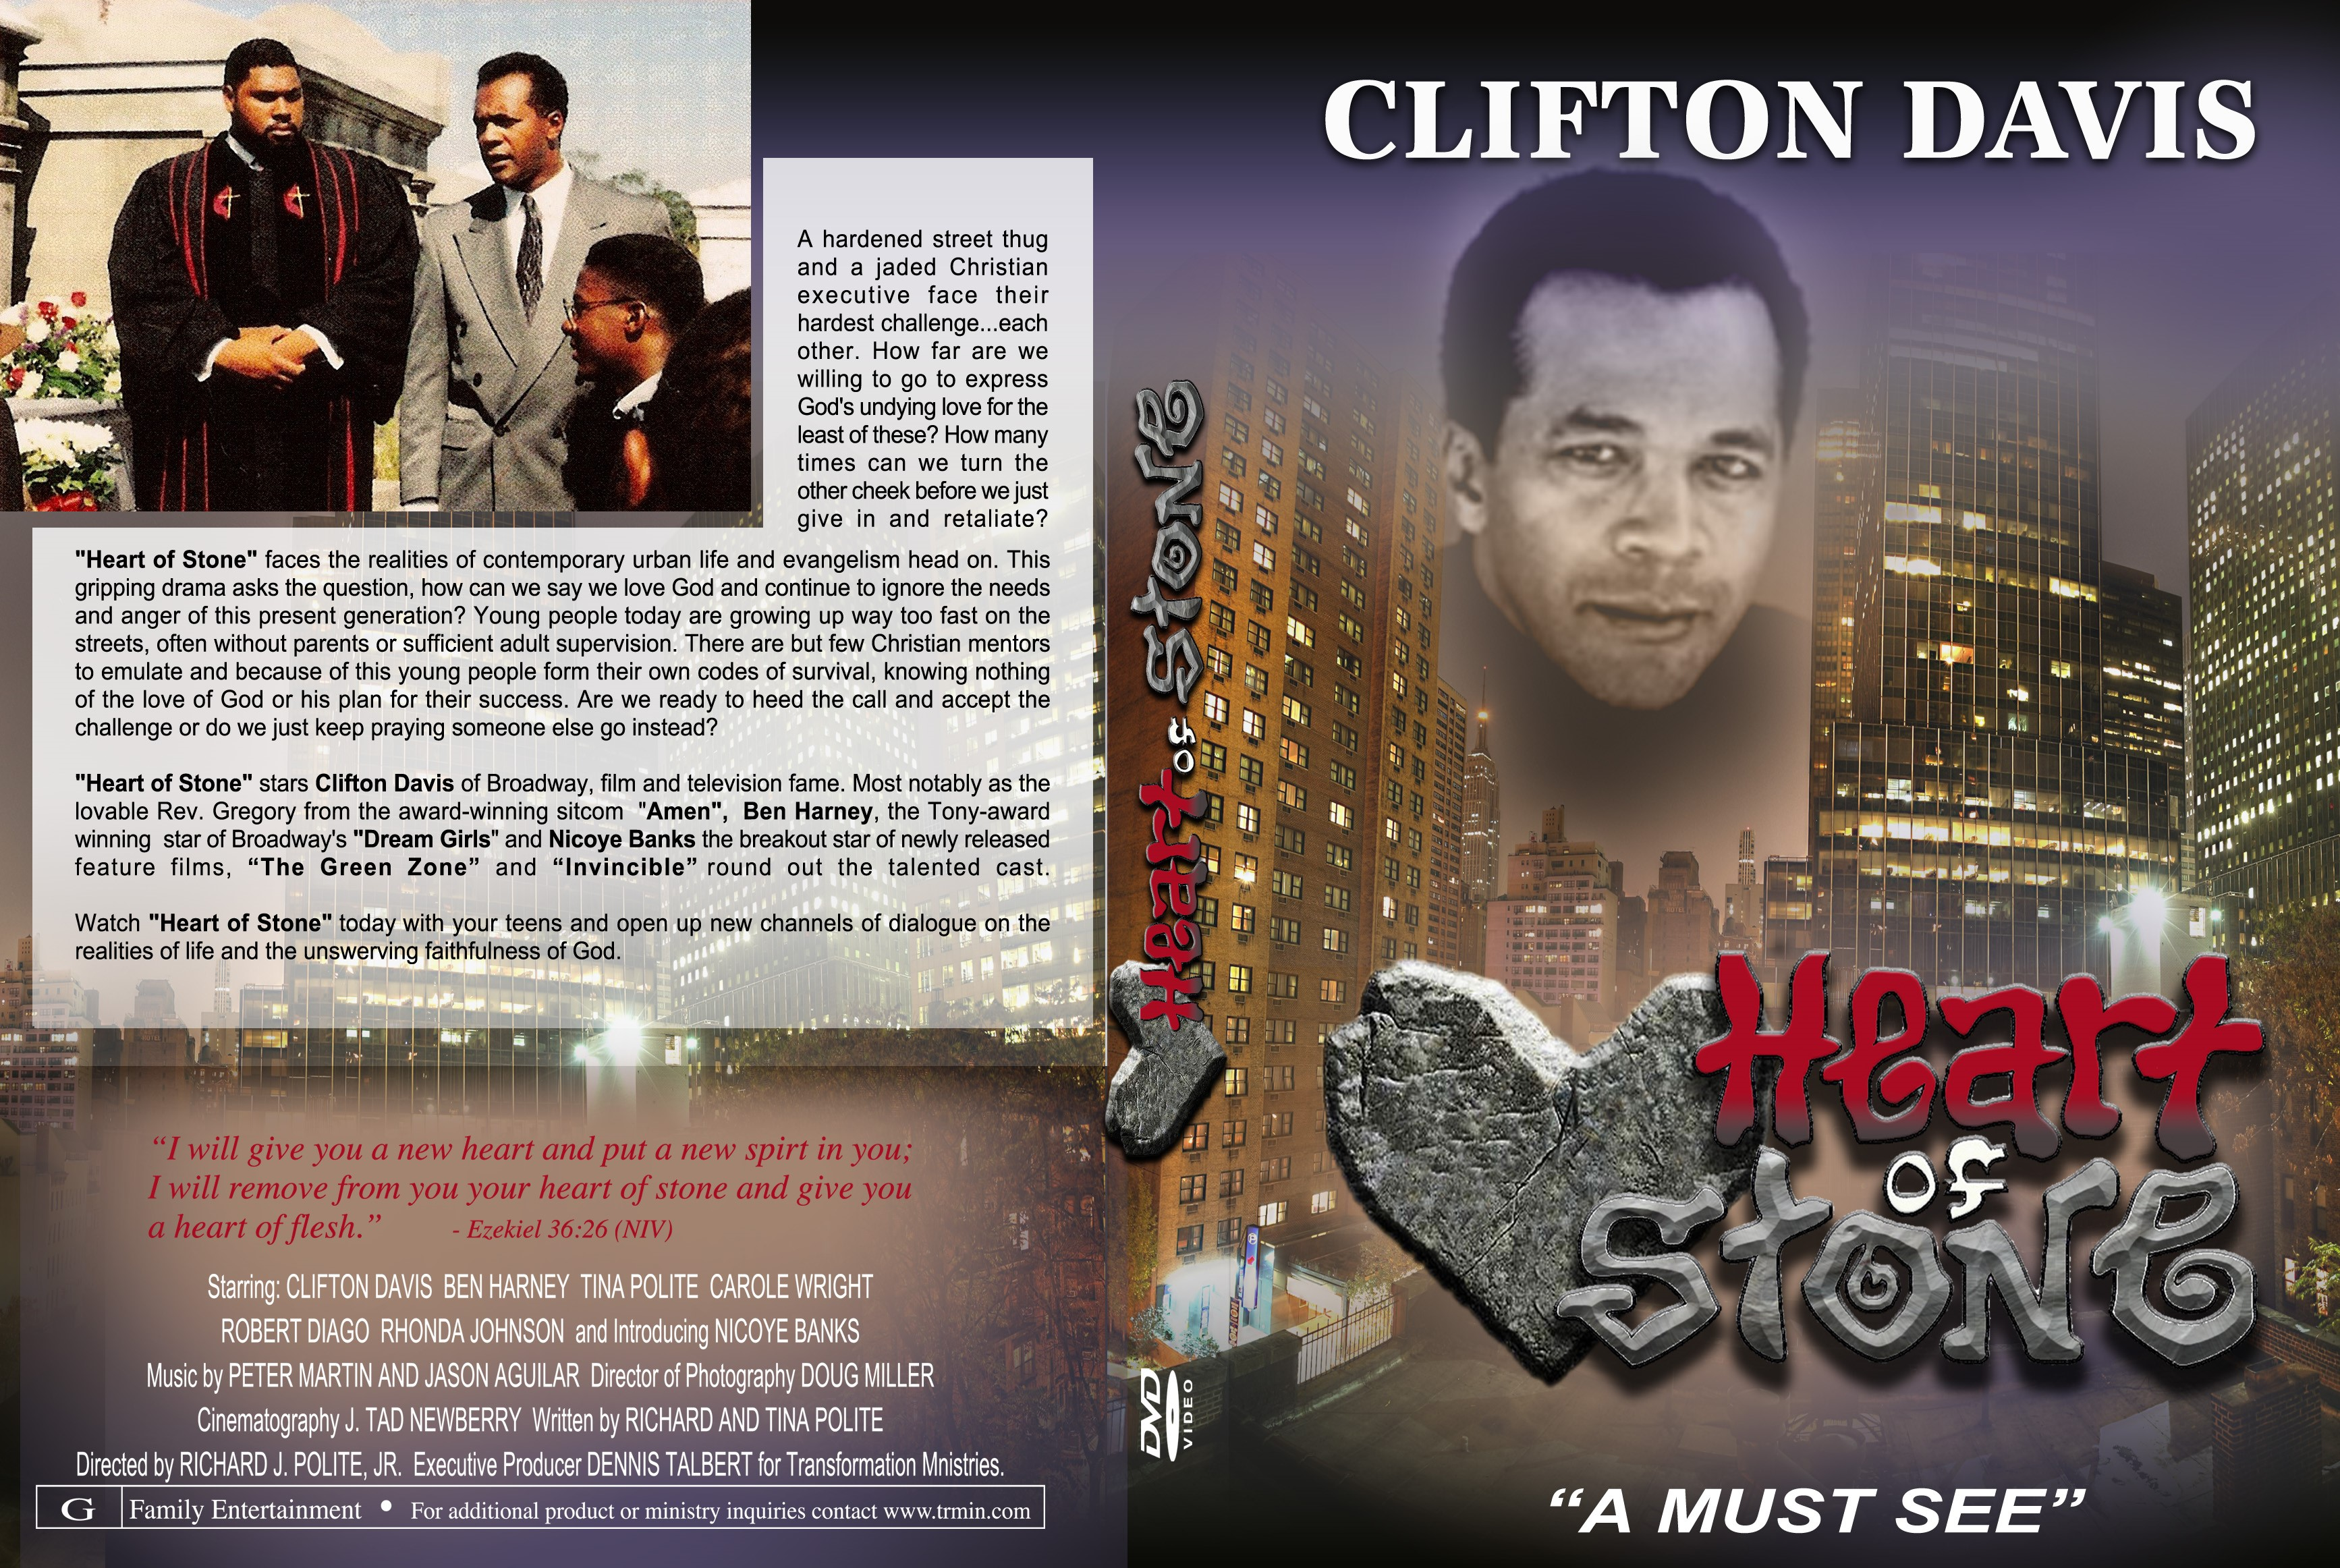 heart of stone film